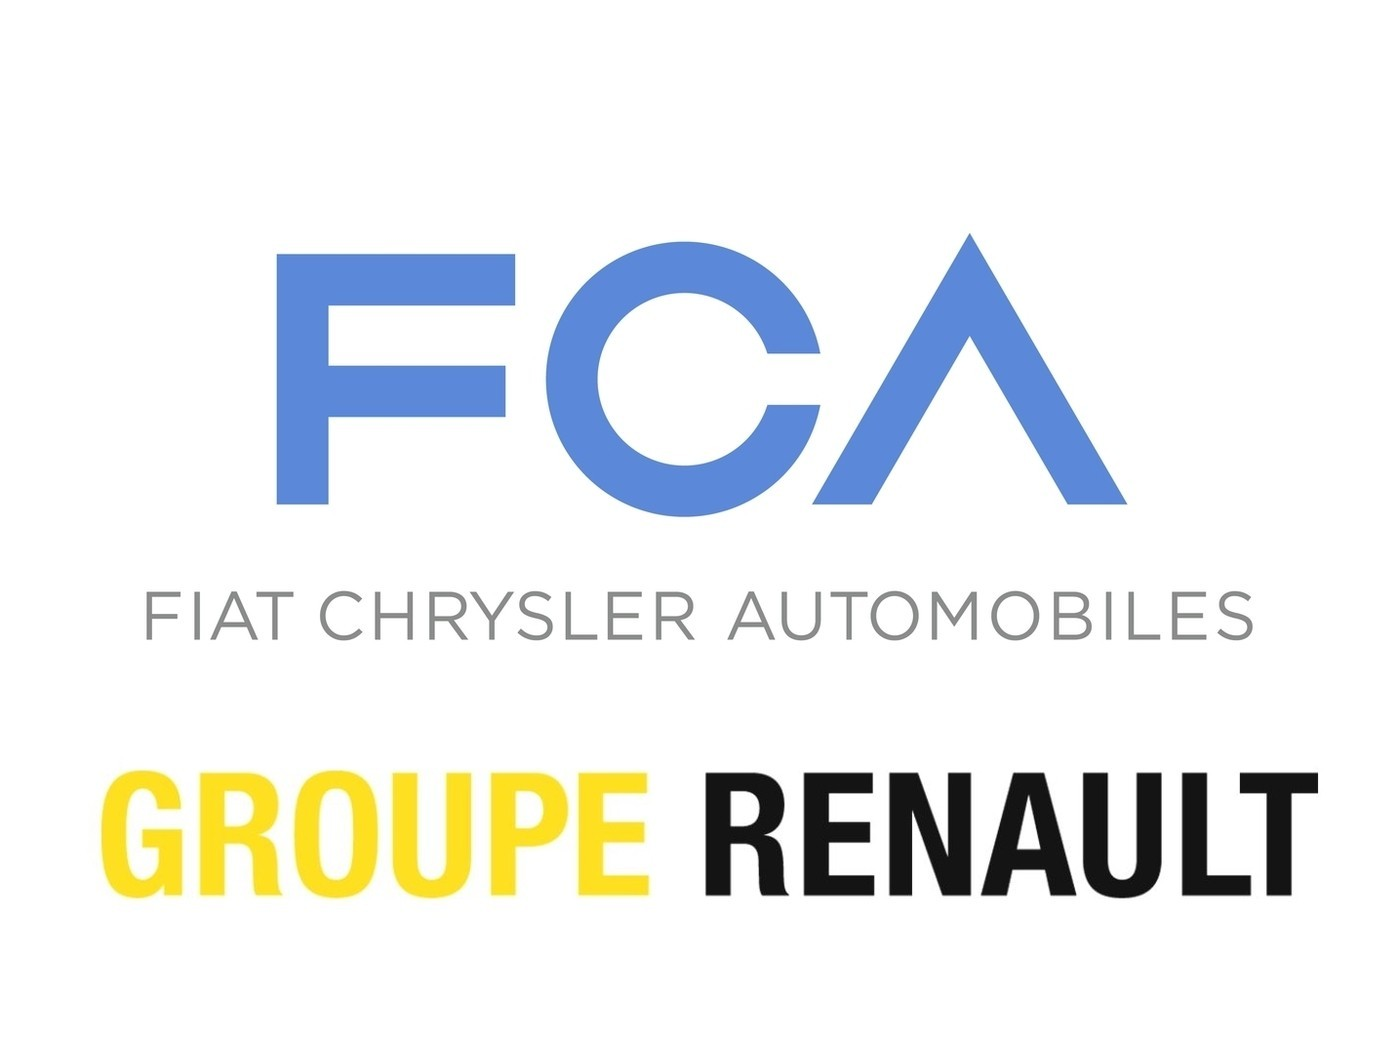 Фиат Chrysler объявил оготовности слияния с Рено - The Financial Times